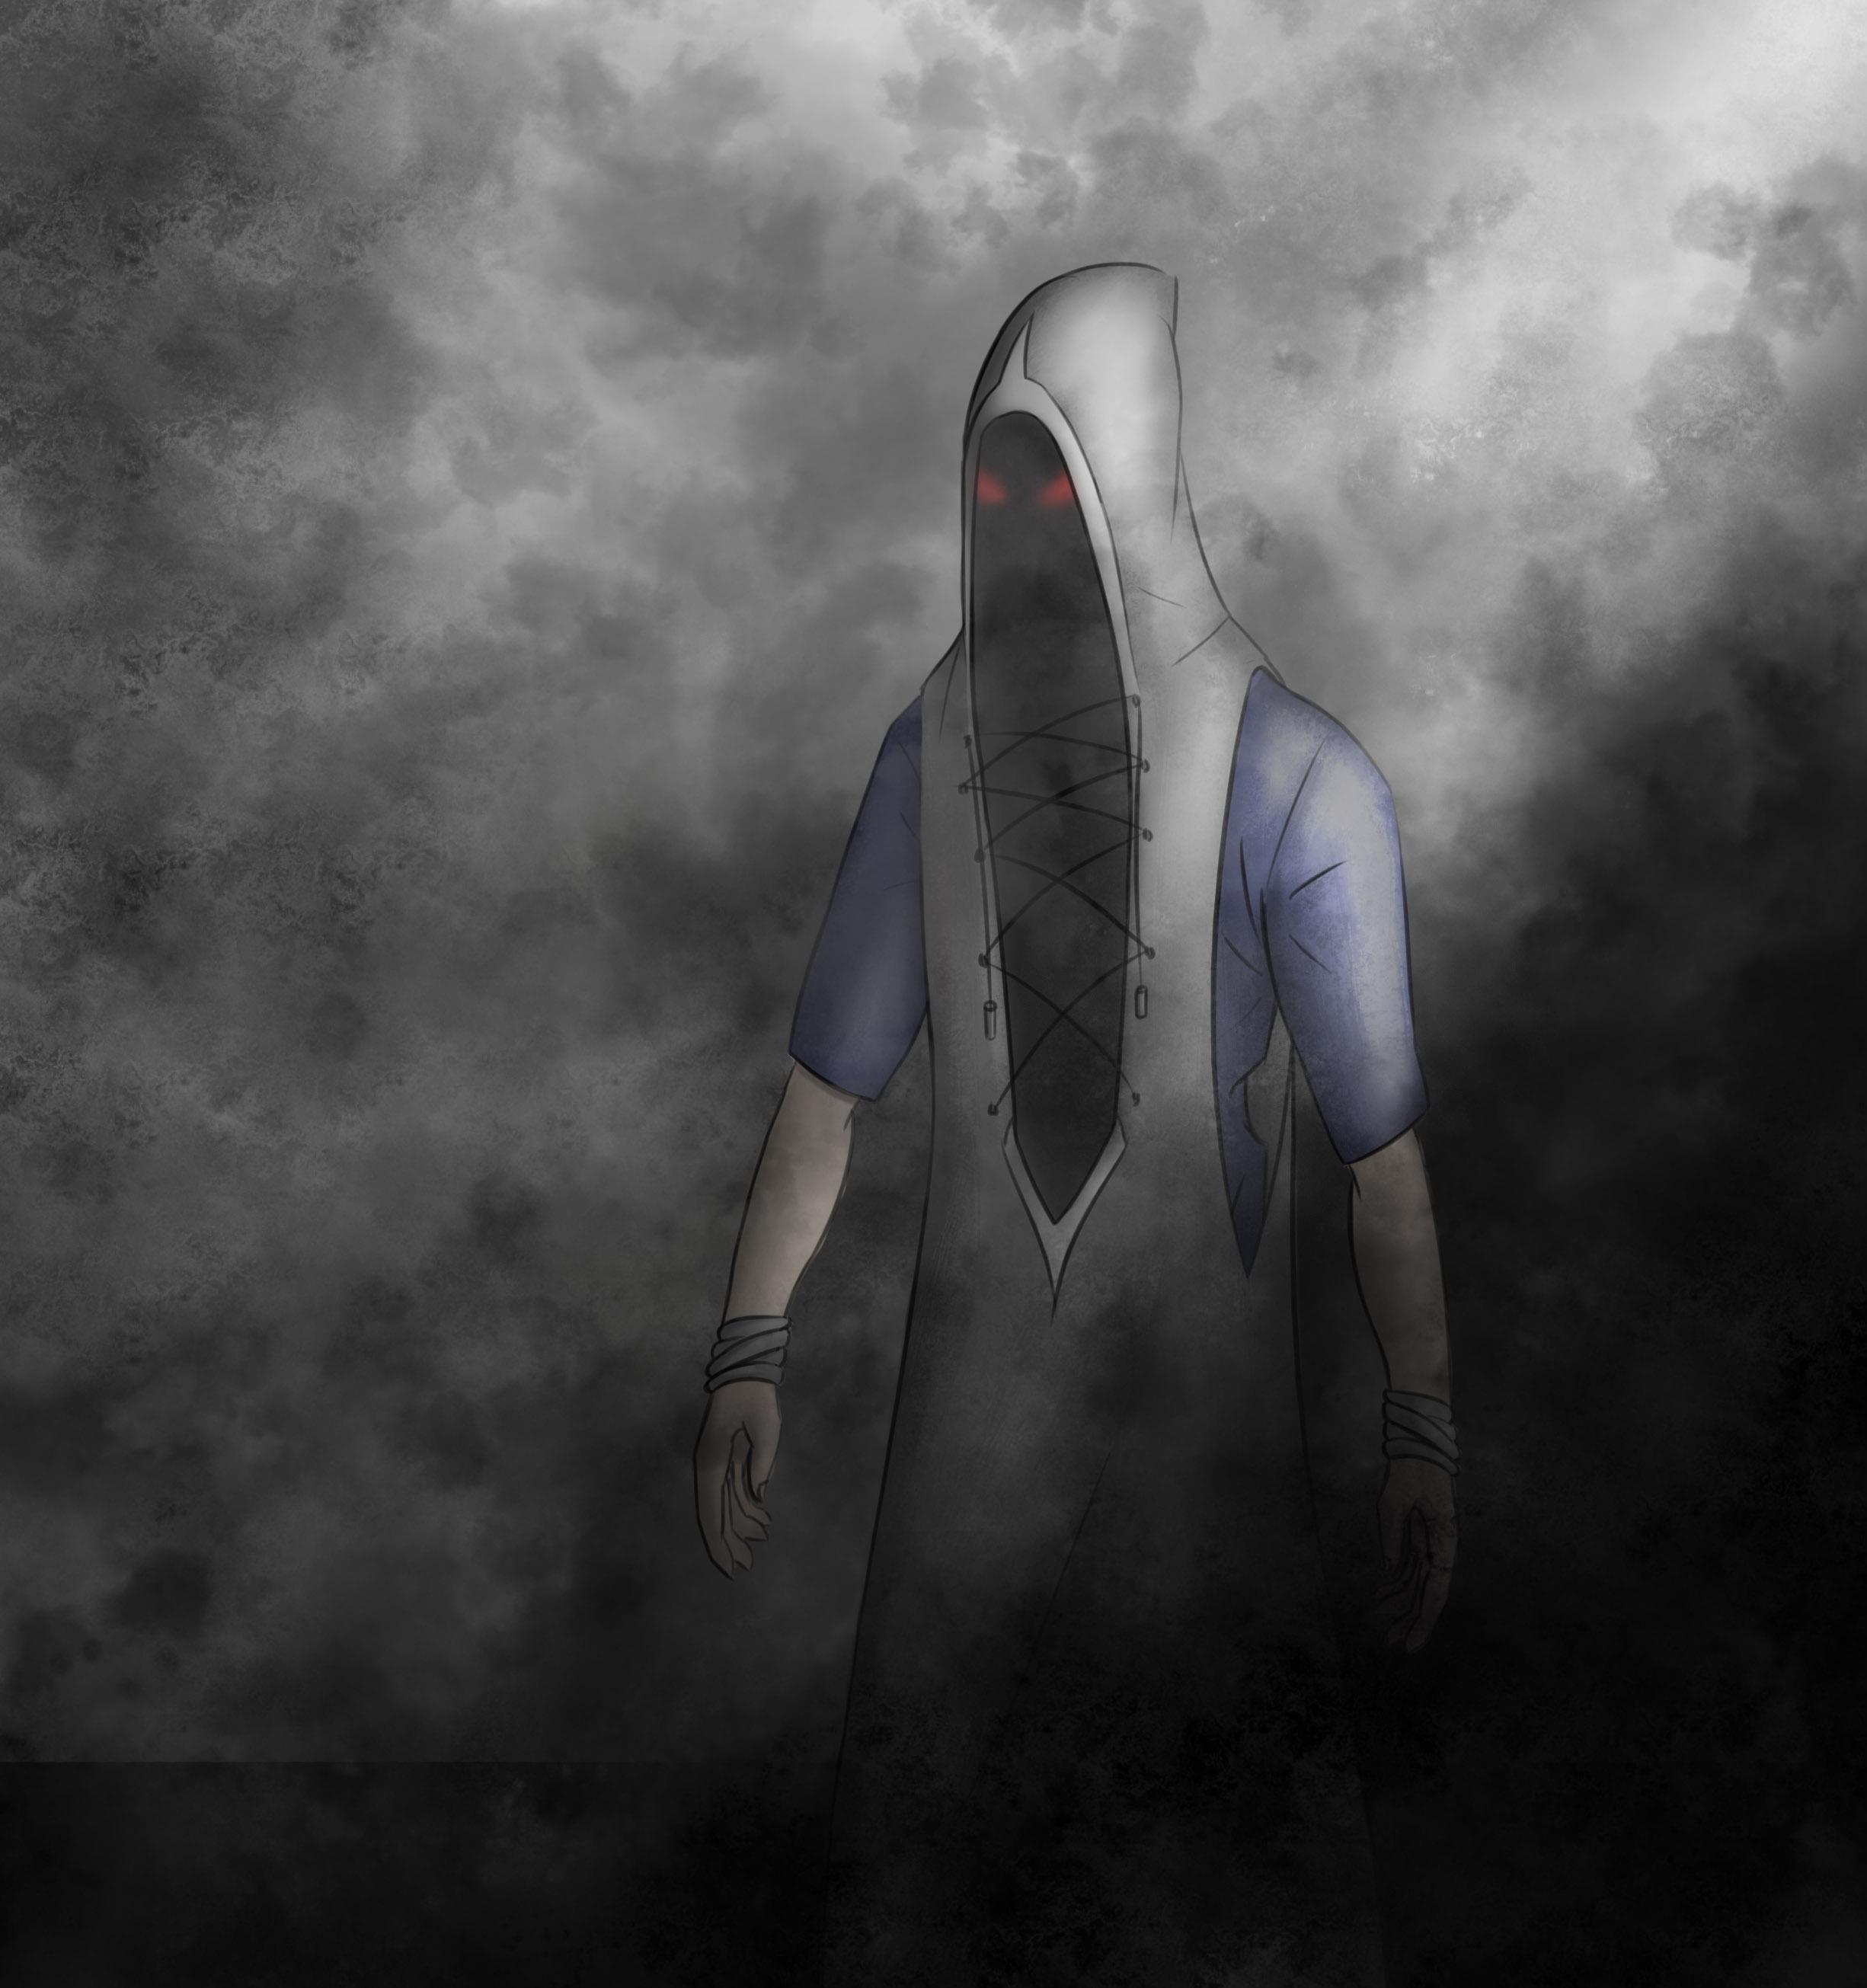 Hooded Bad Guy